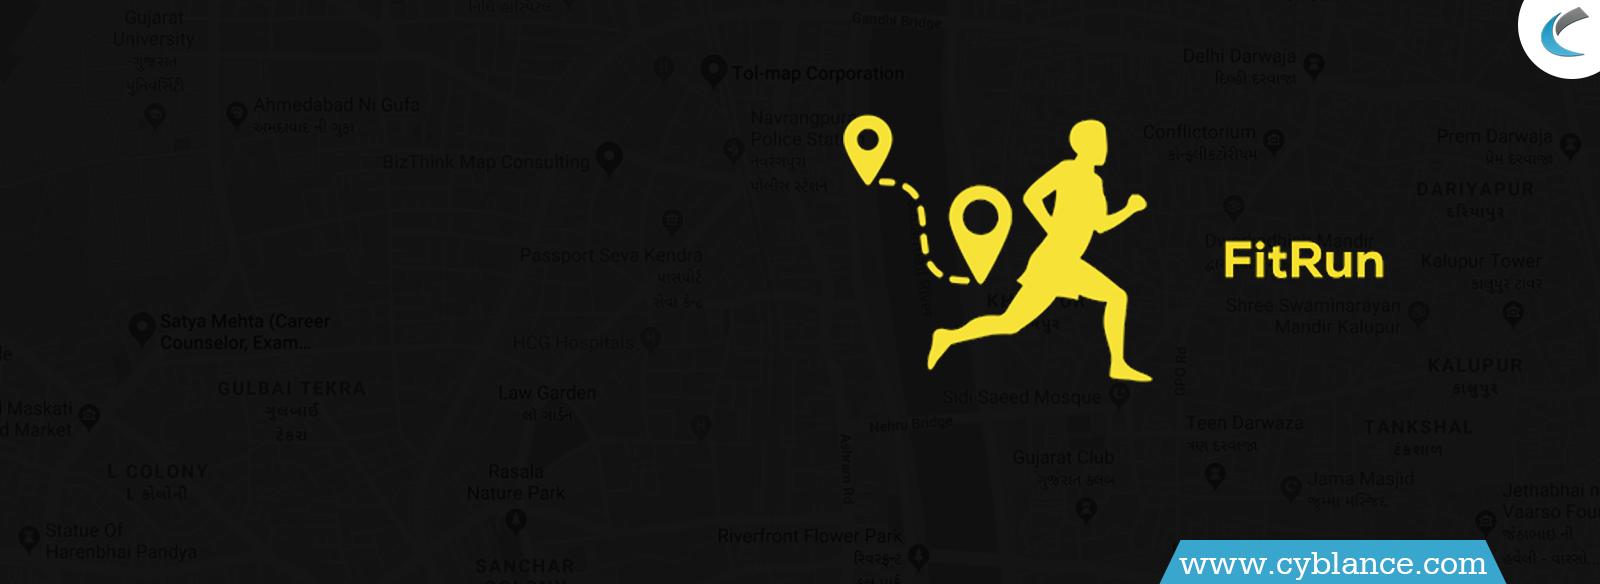 FitRun - Your Run Tracker - Run Tracker App